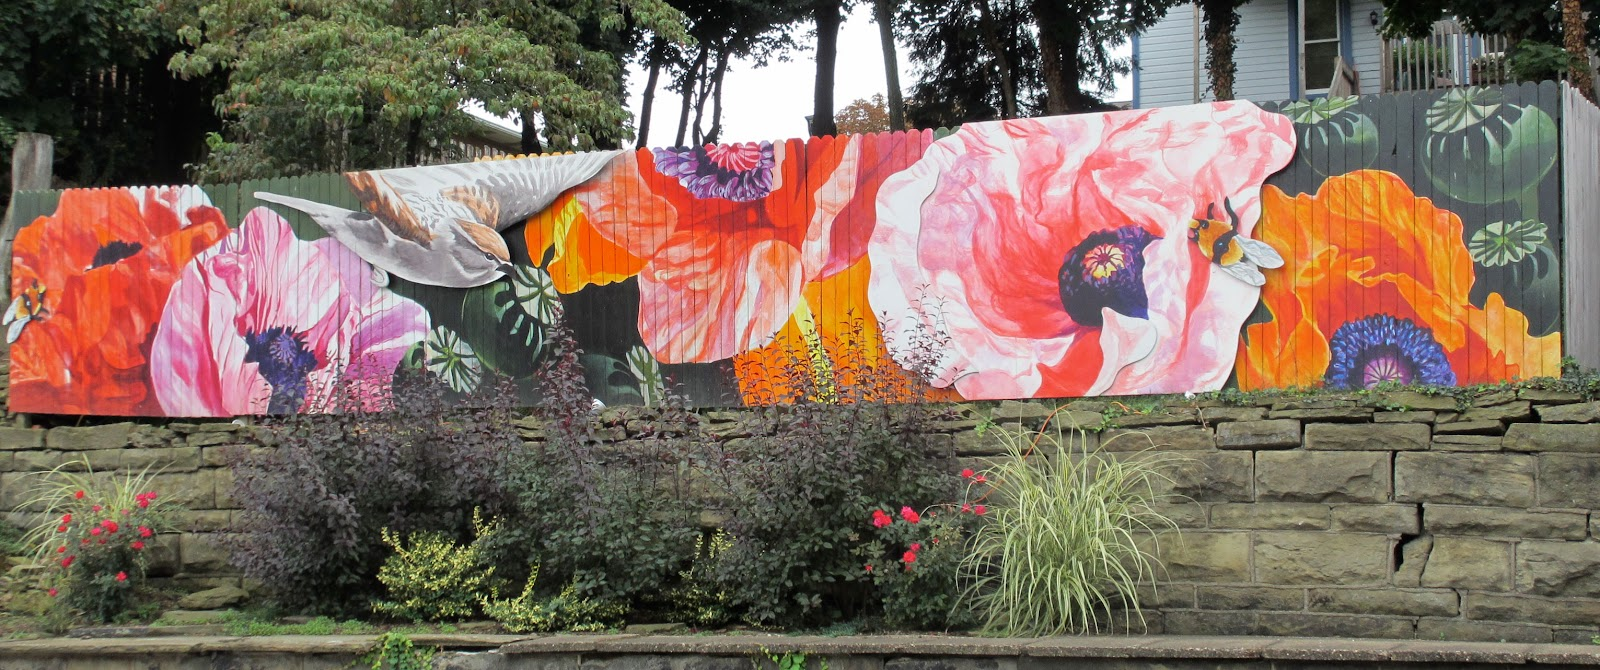 Superior Garden Themed Mural By Ashley Hodder